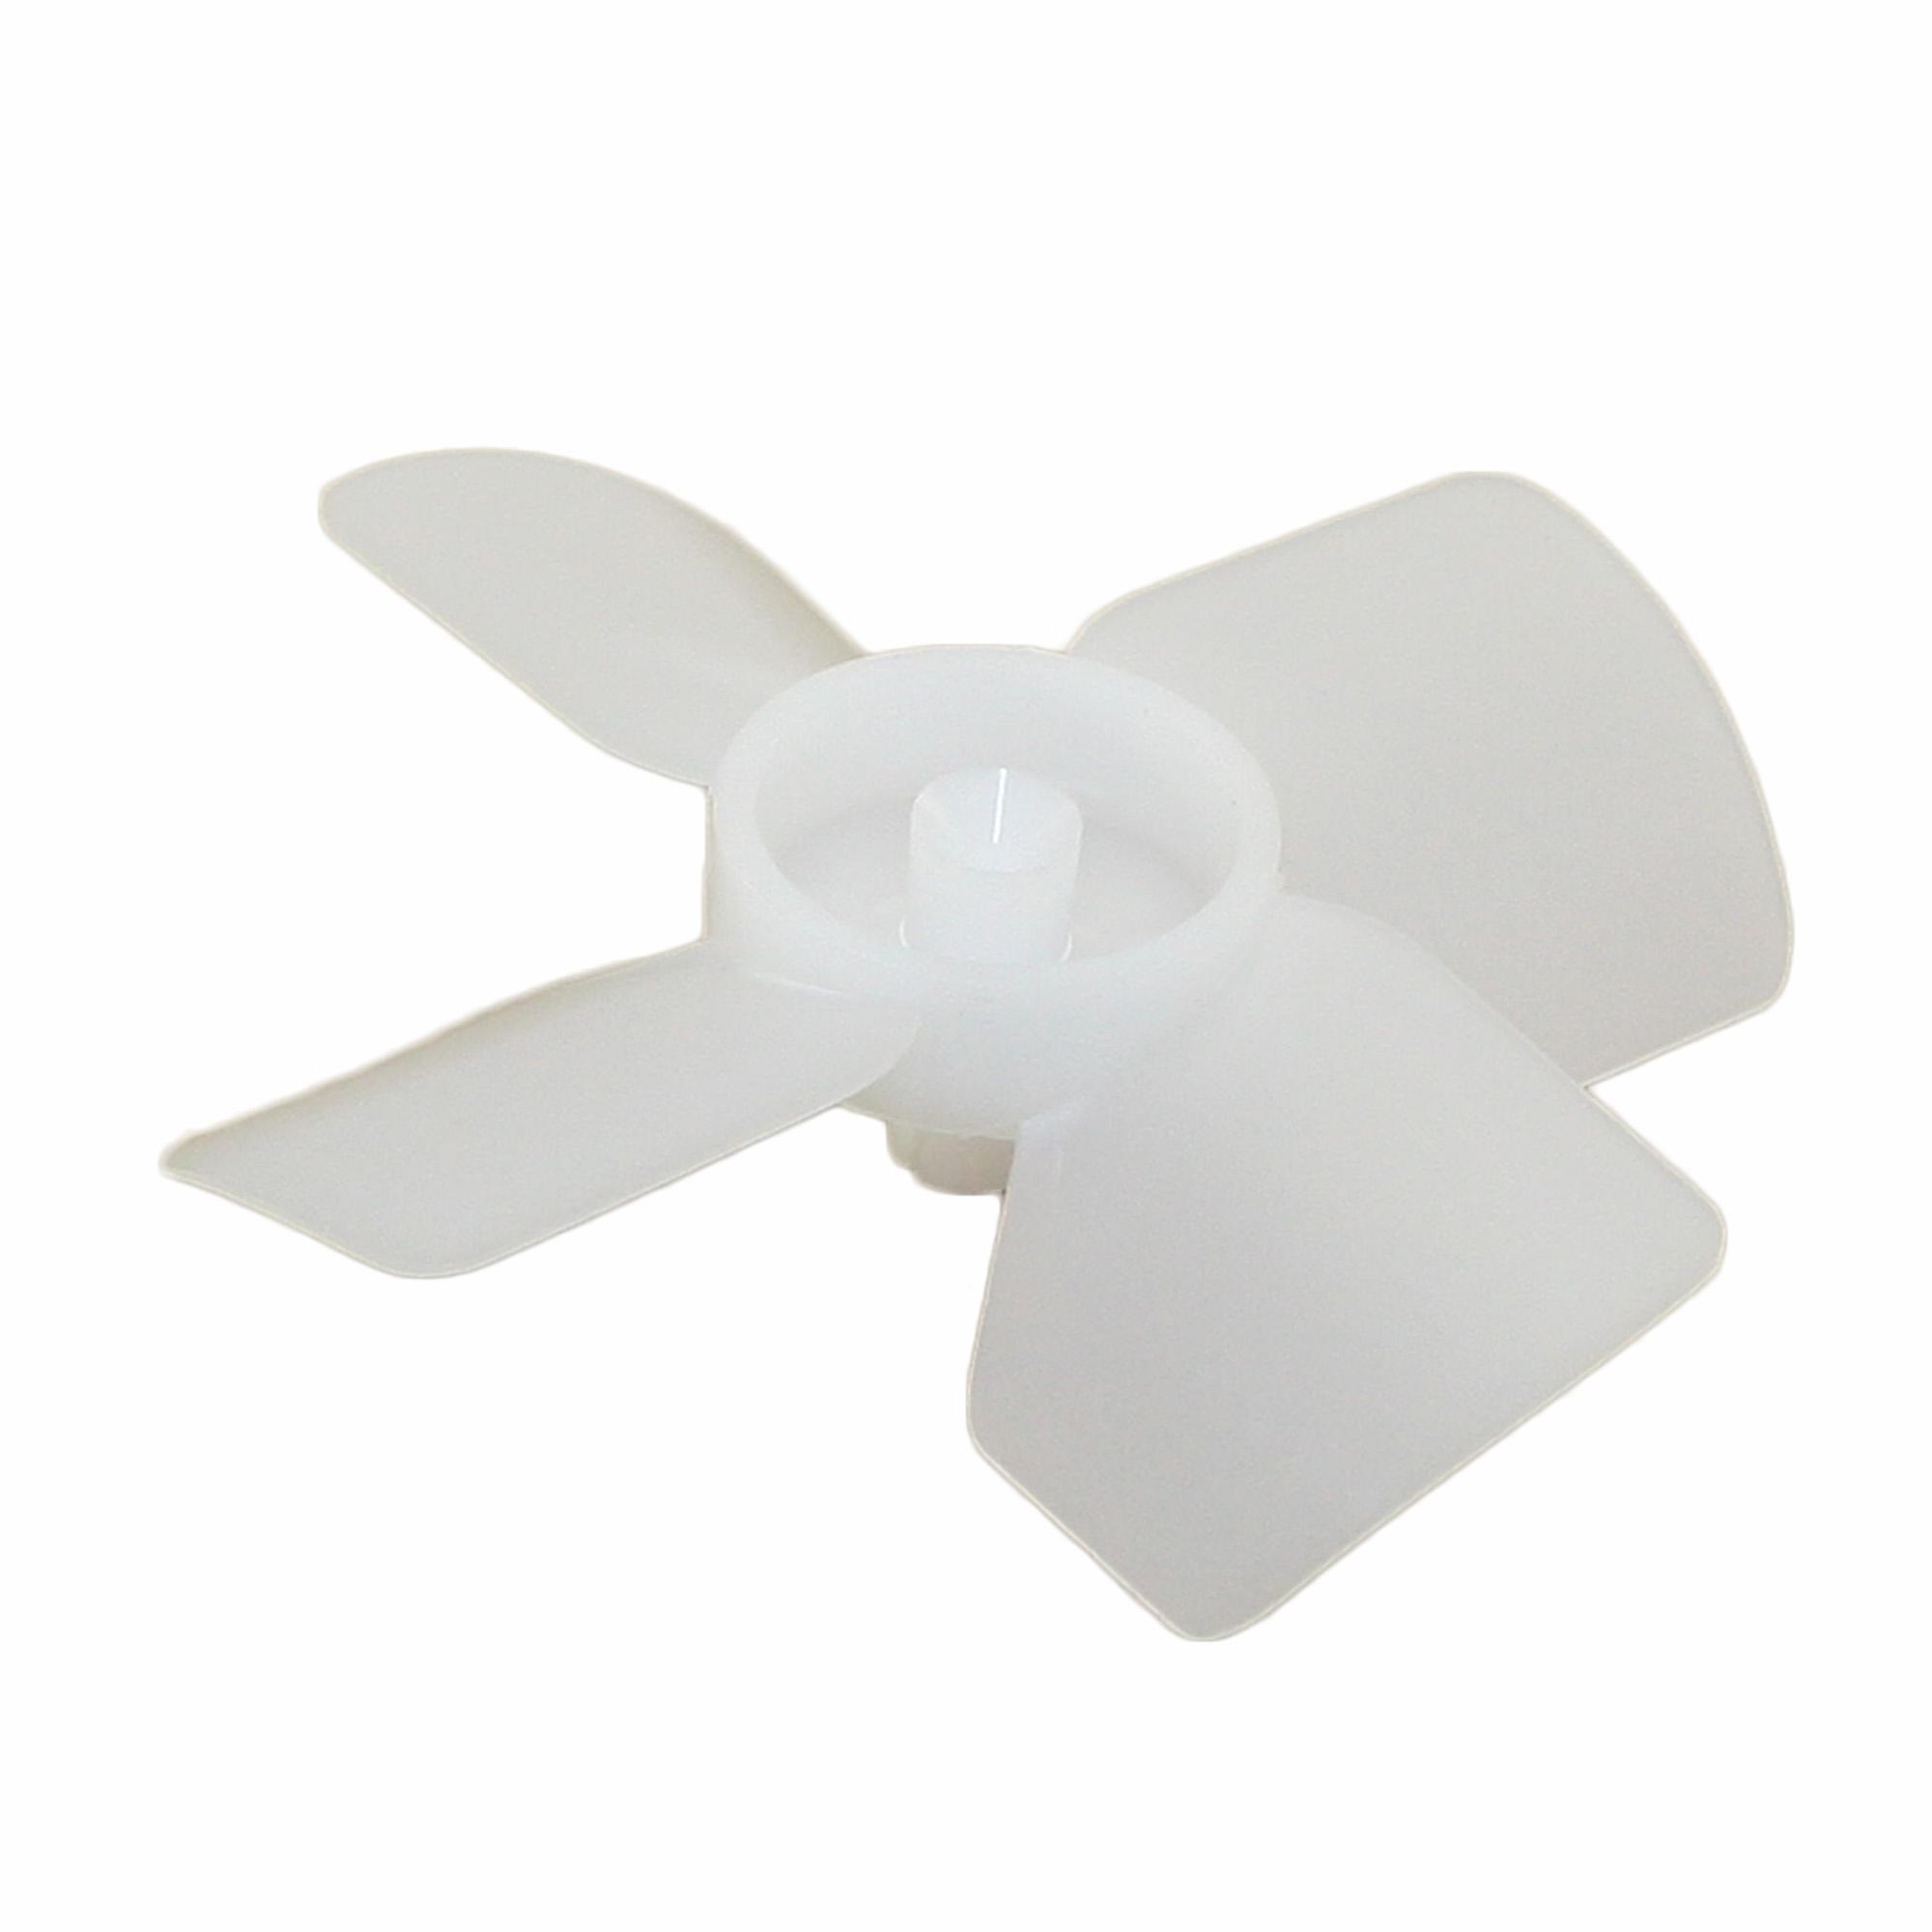 5308000010 frigidaire refrigerator evaporator fan motor for Frigidaire evaporator fan motor